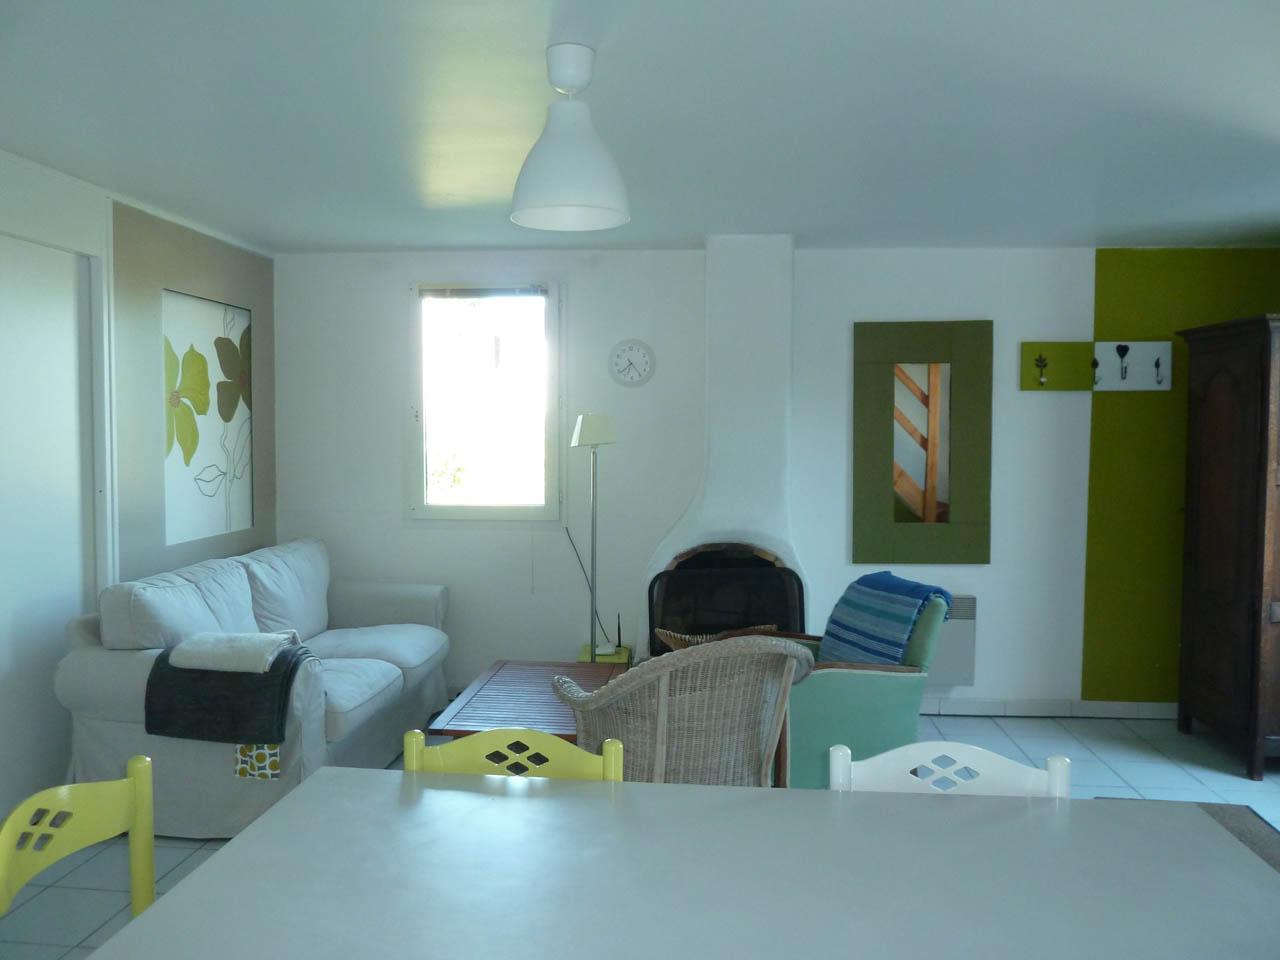 maison keroyan est meubl louer belle le en mer. Black Bedroom Furniture Sets. Home Design Ideas